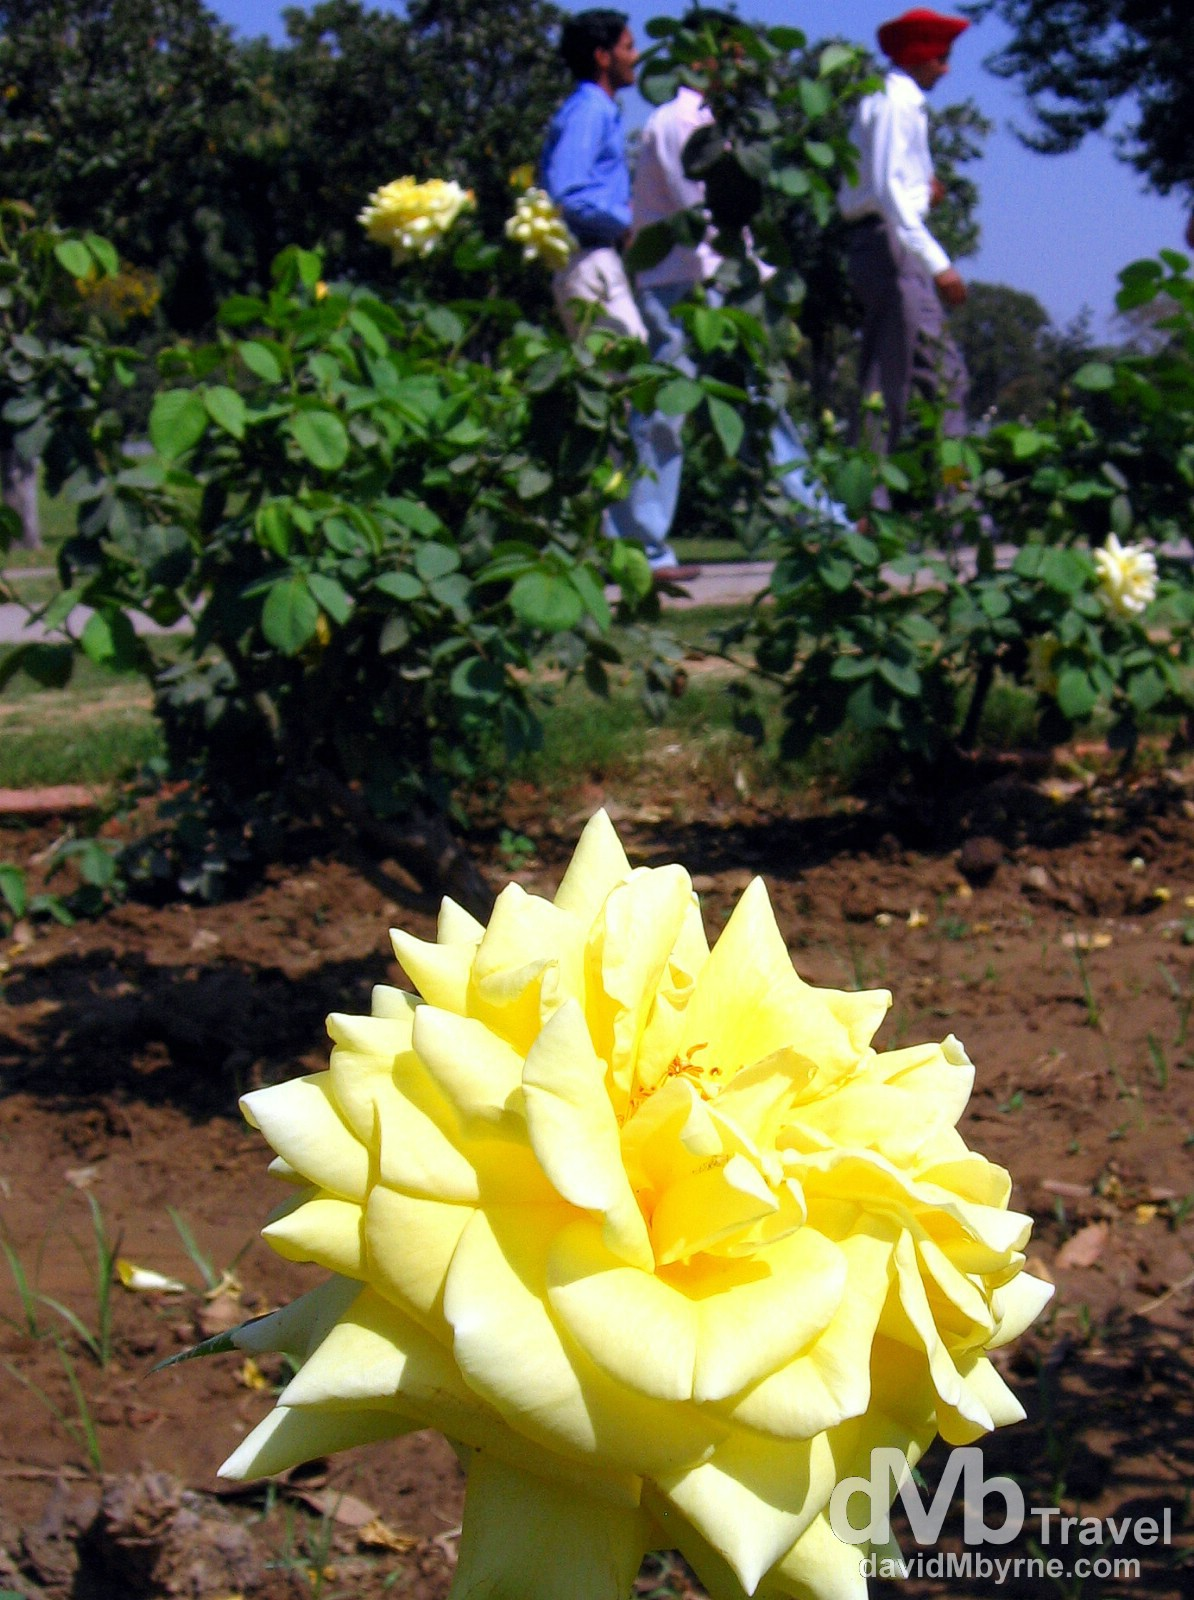 Rose Garden, Chandigarh, Punjab, India. March 23, 2008.